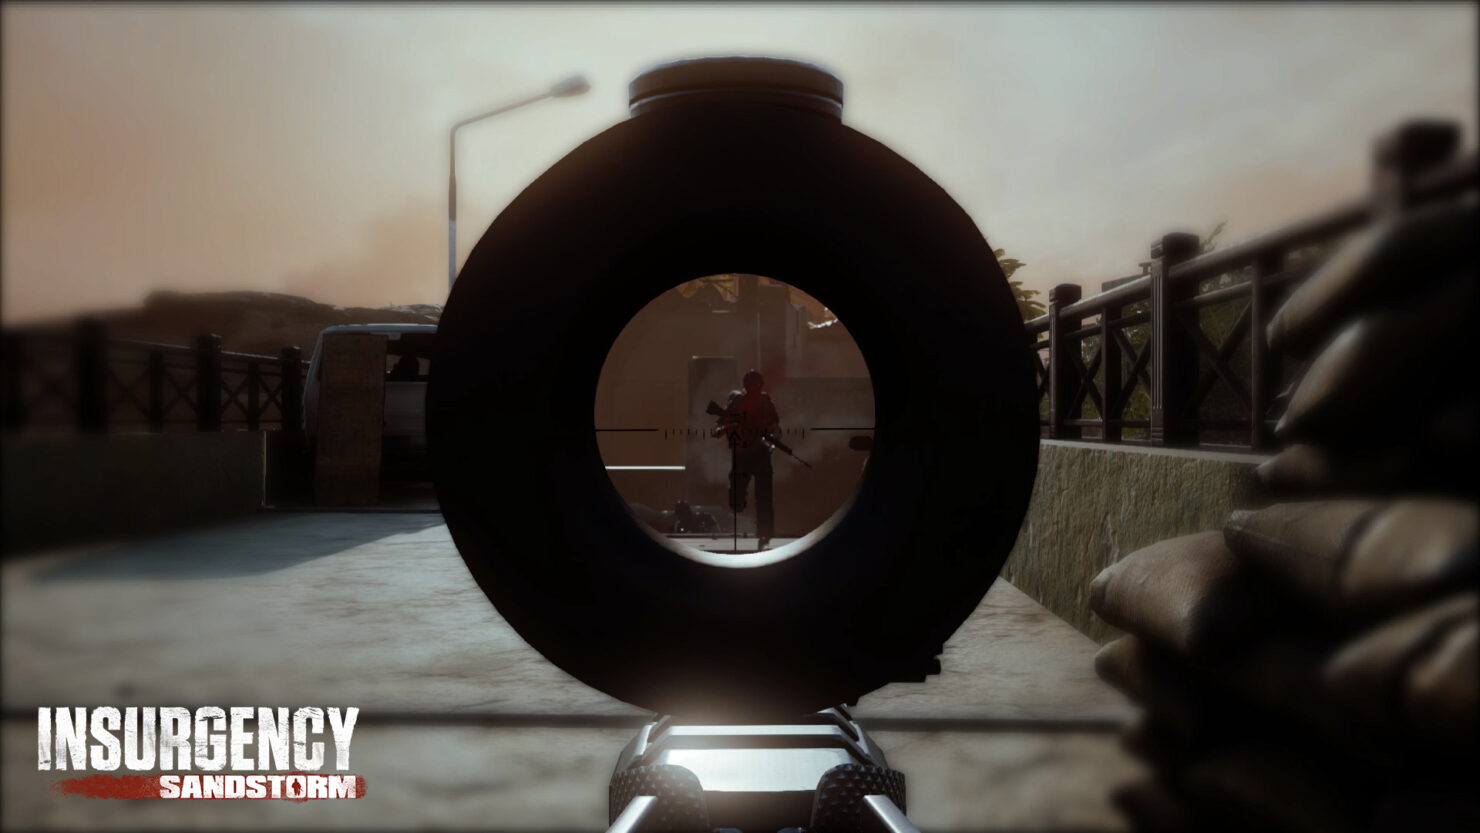 insurgency_sandstorm-screenshot-09-new_logo